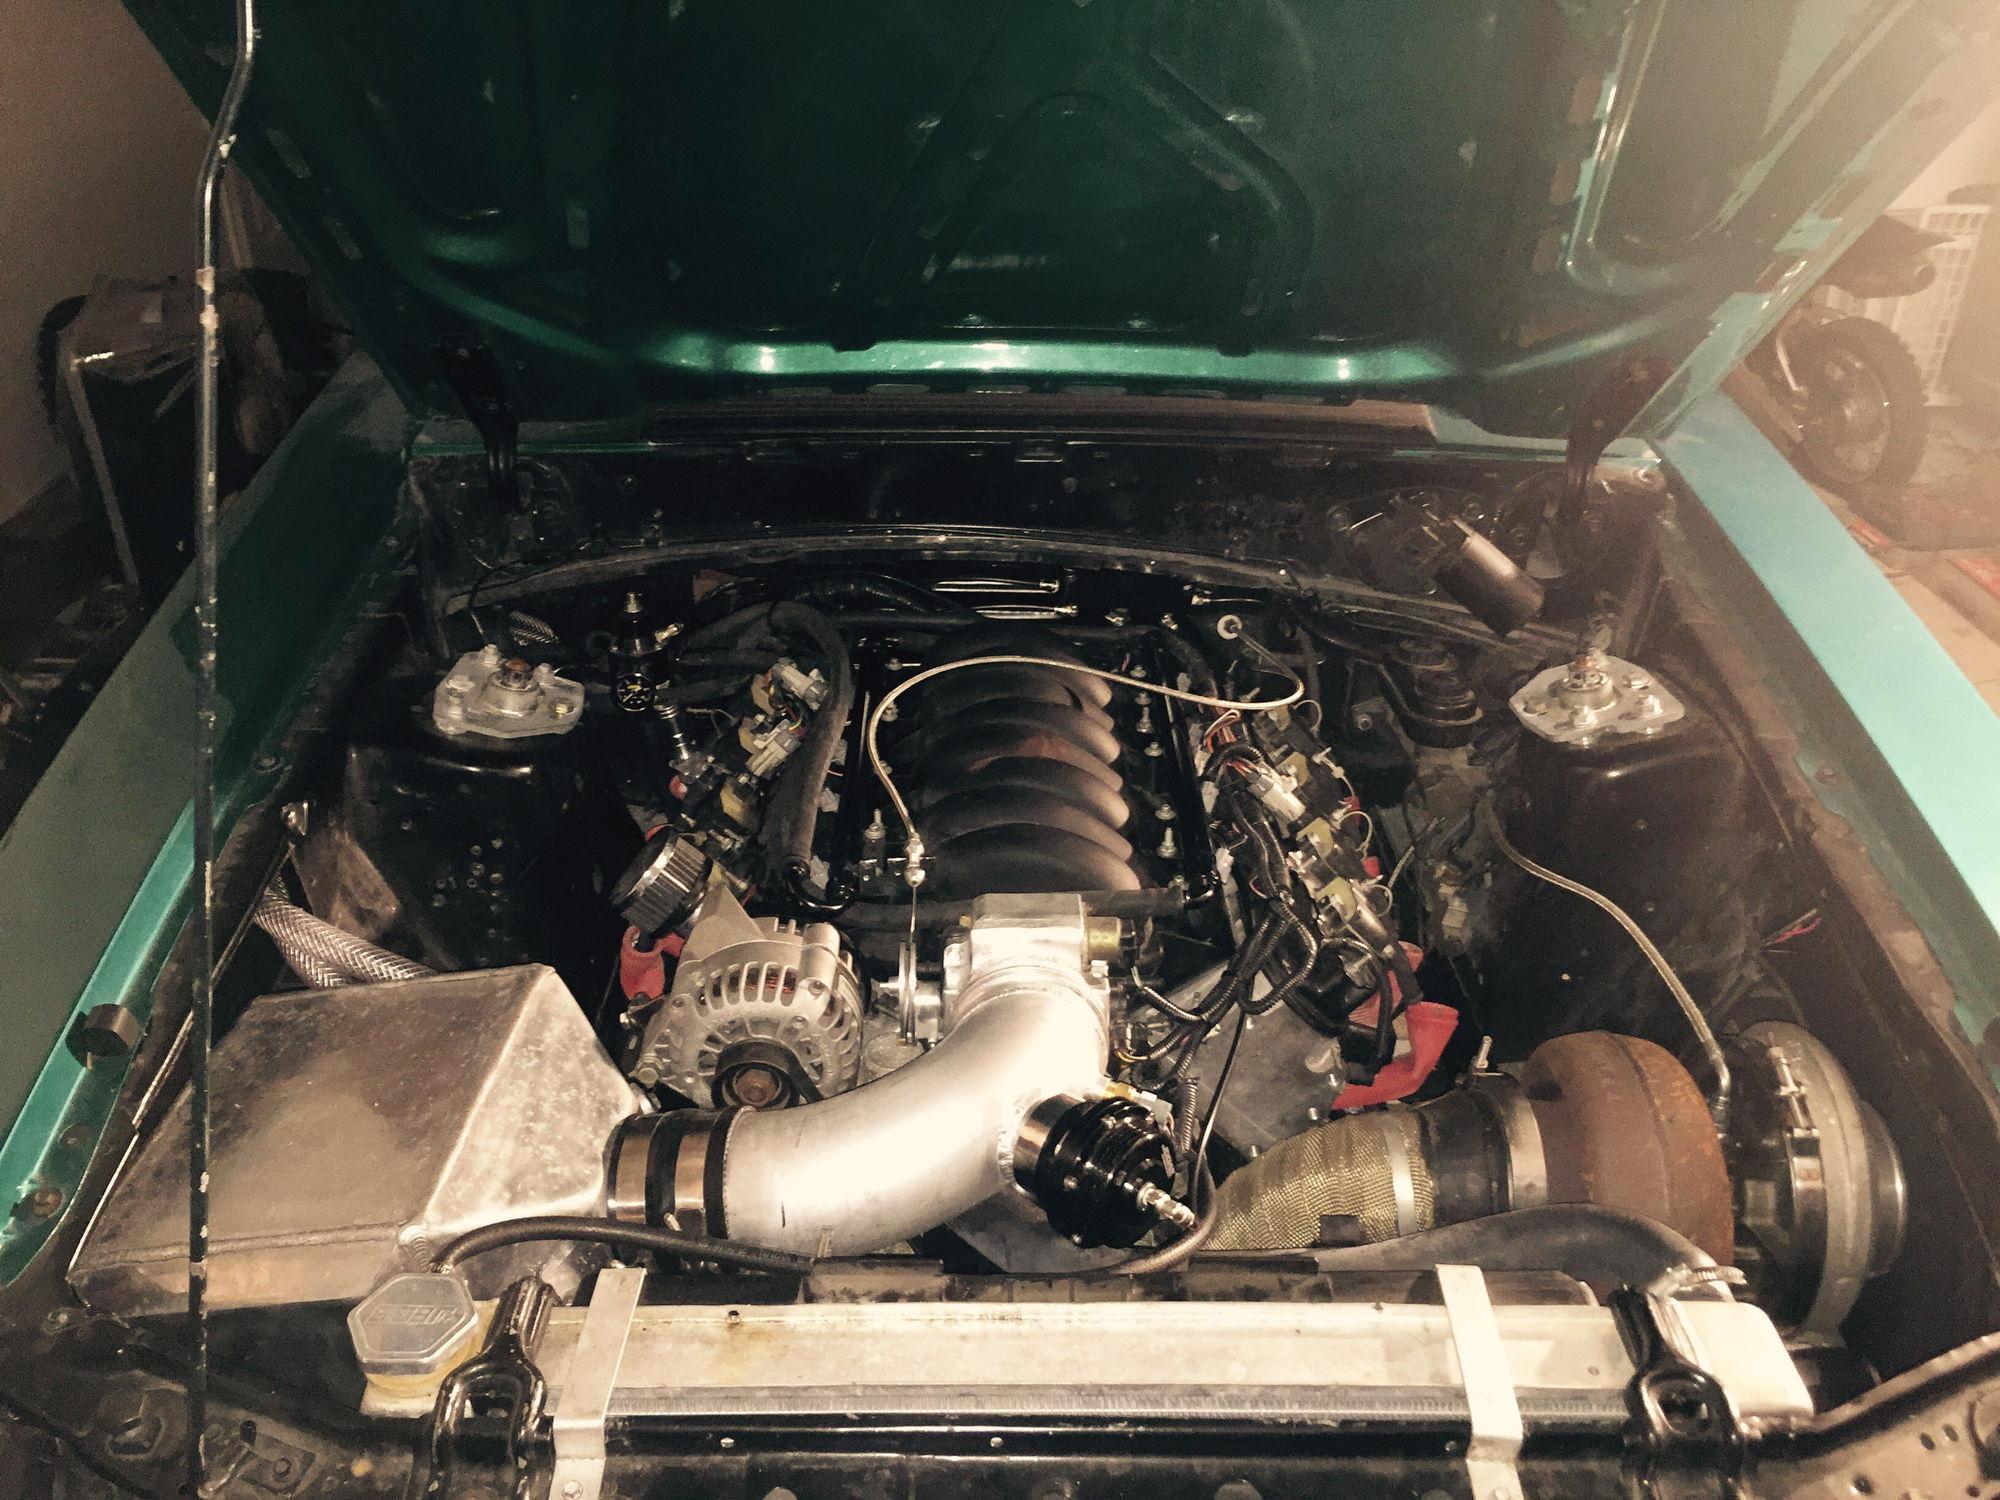 Arp Head Studs 6.0 >> 91 mustang ls turbo street car - LS1TECH